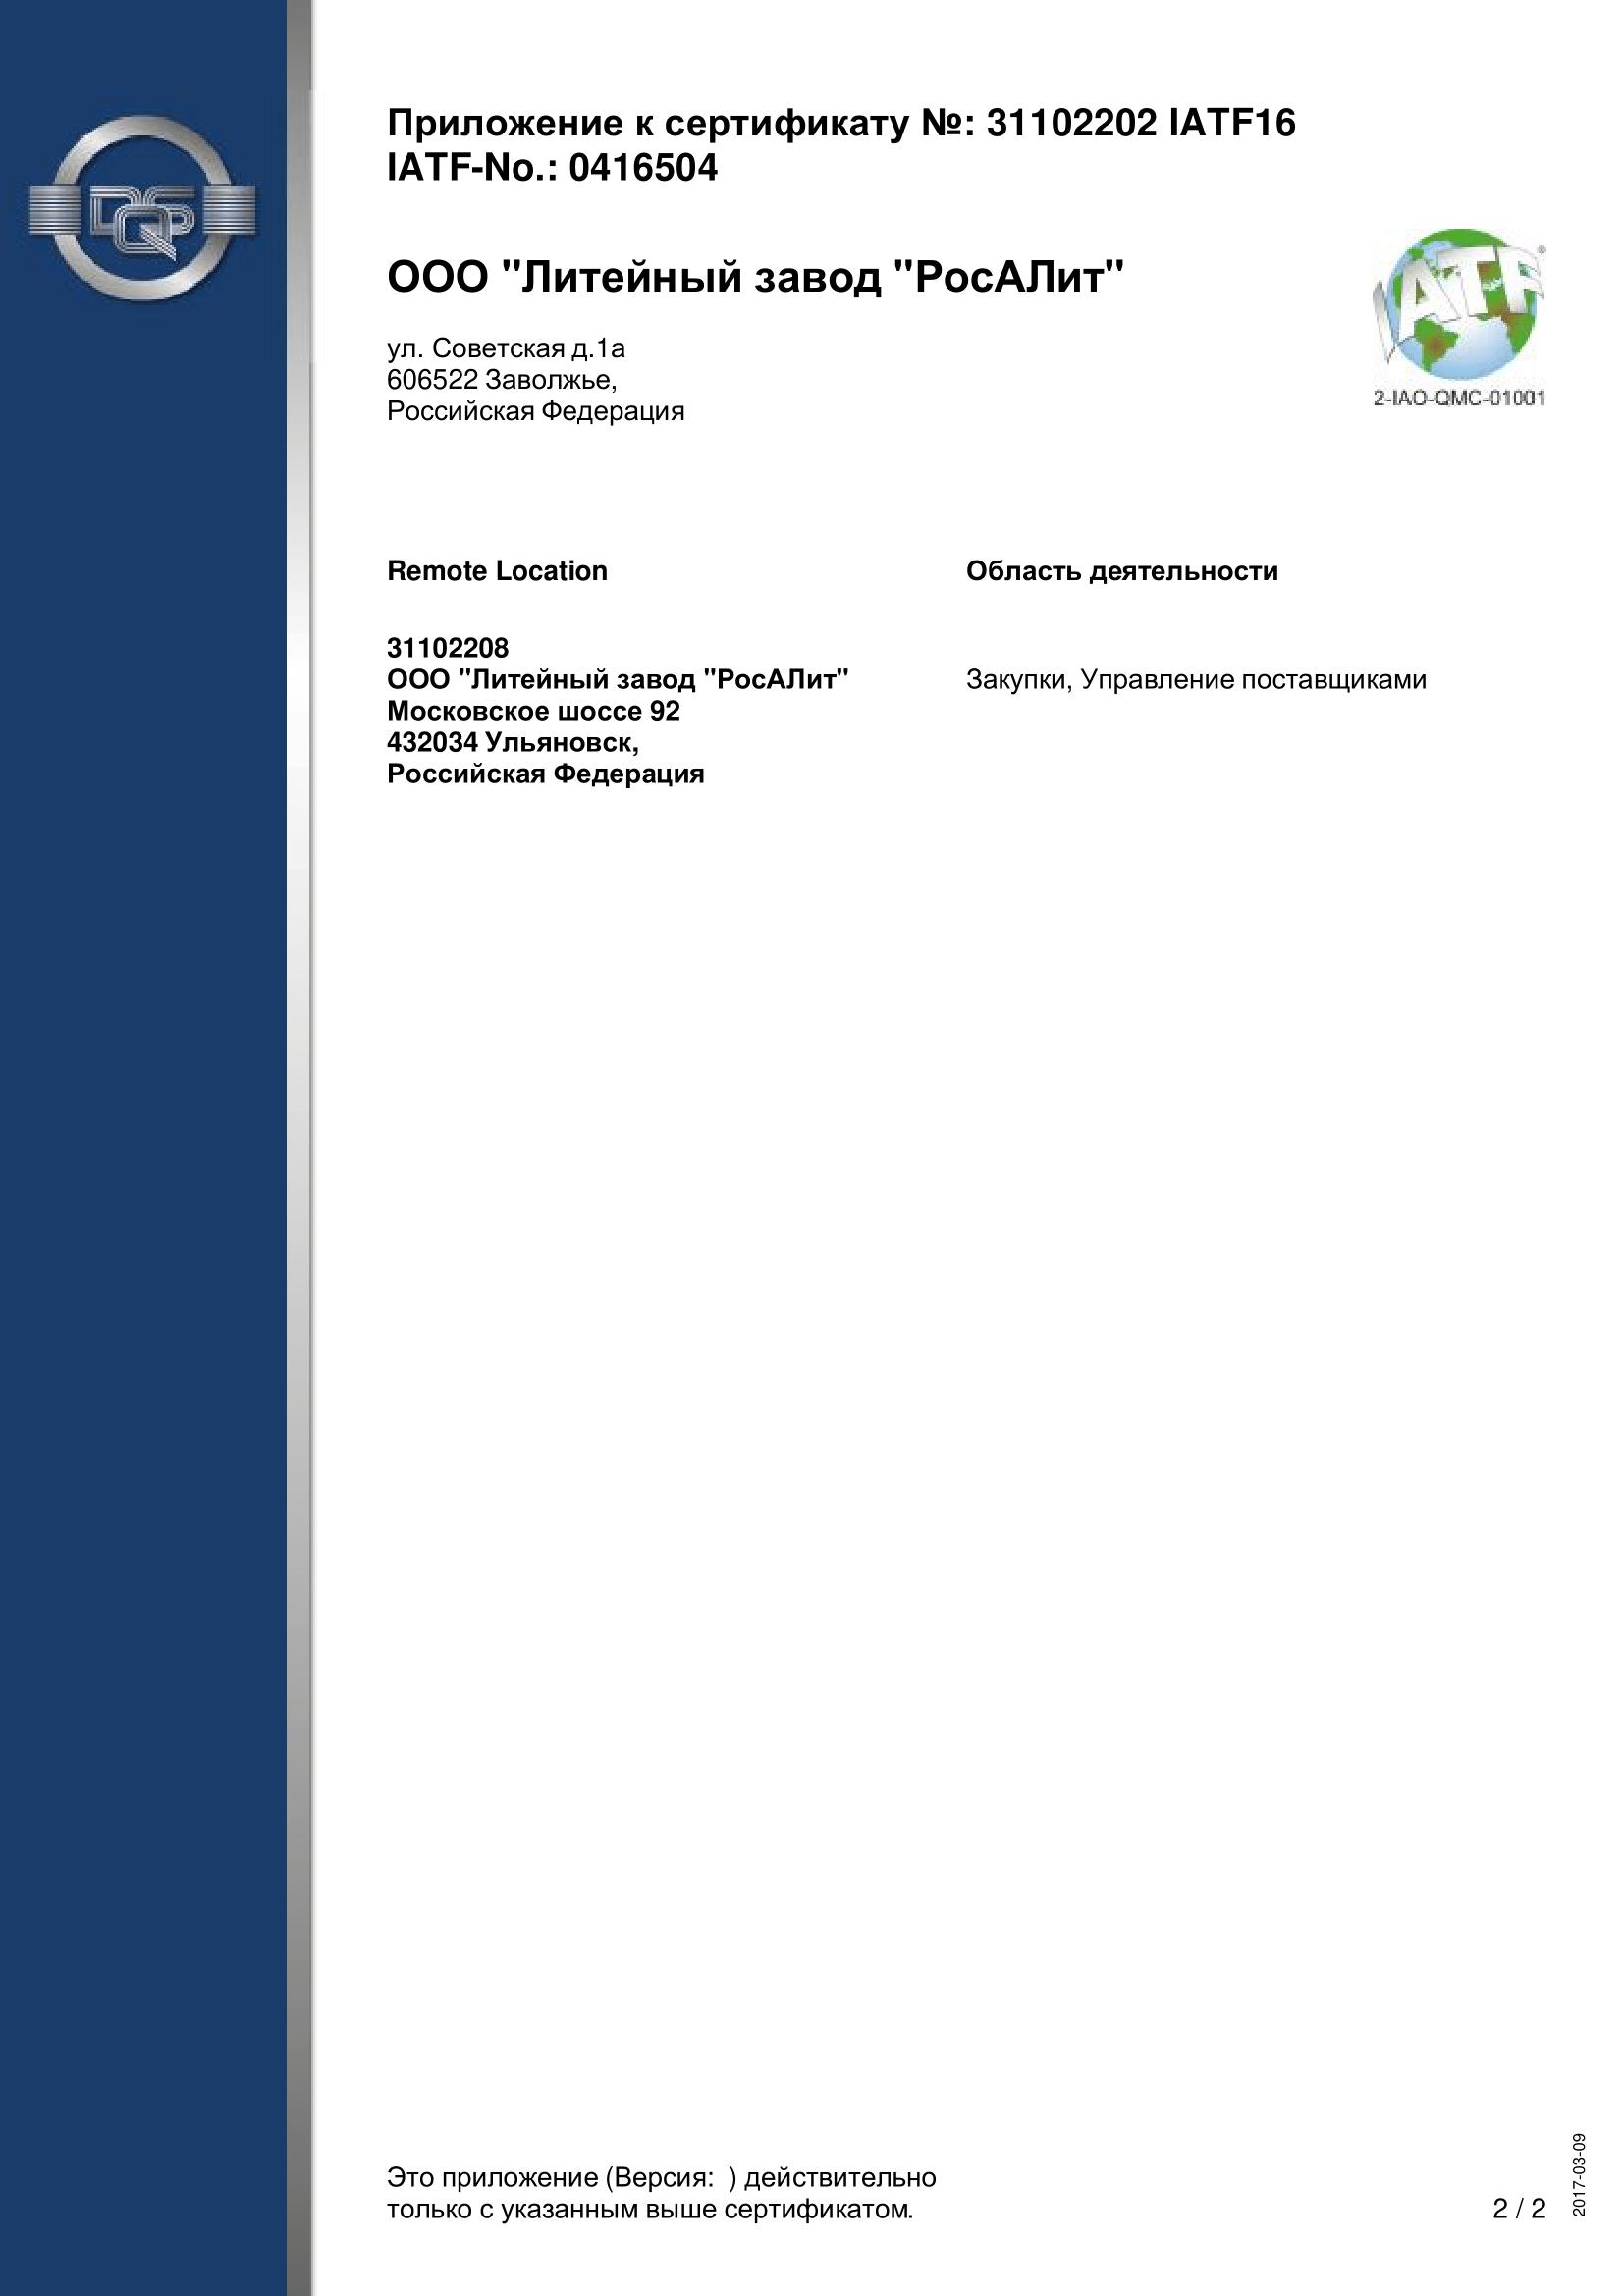 rekomendatelnoe_pismo_1